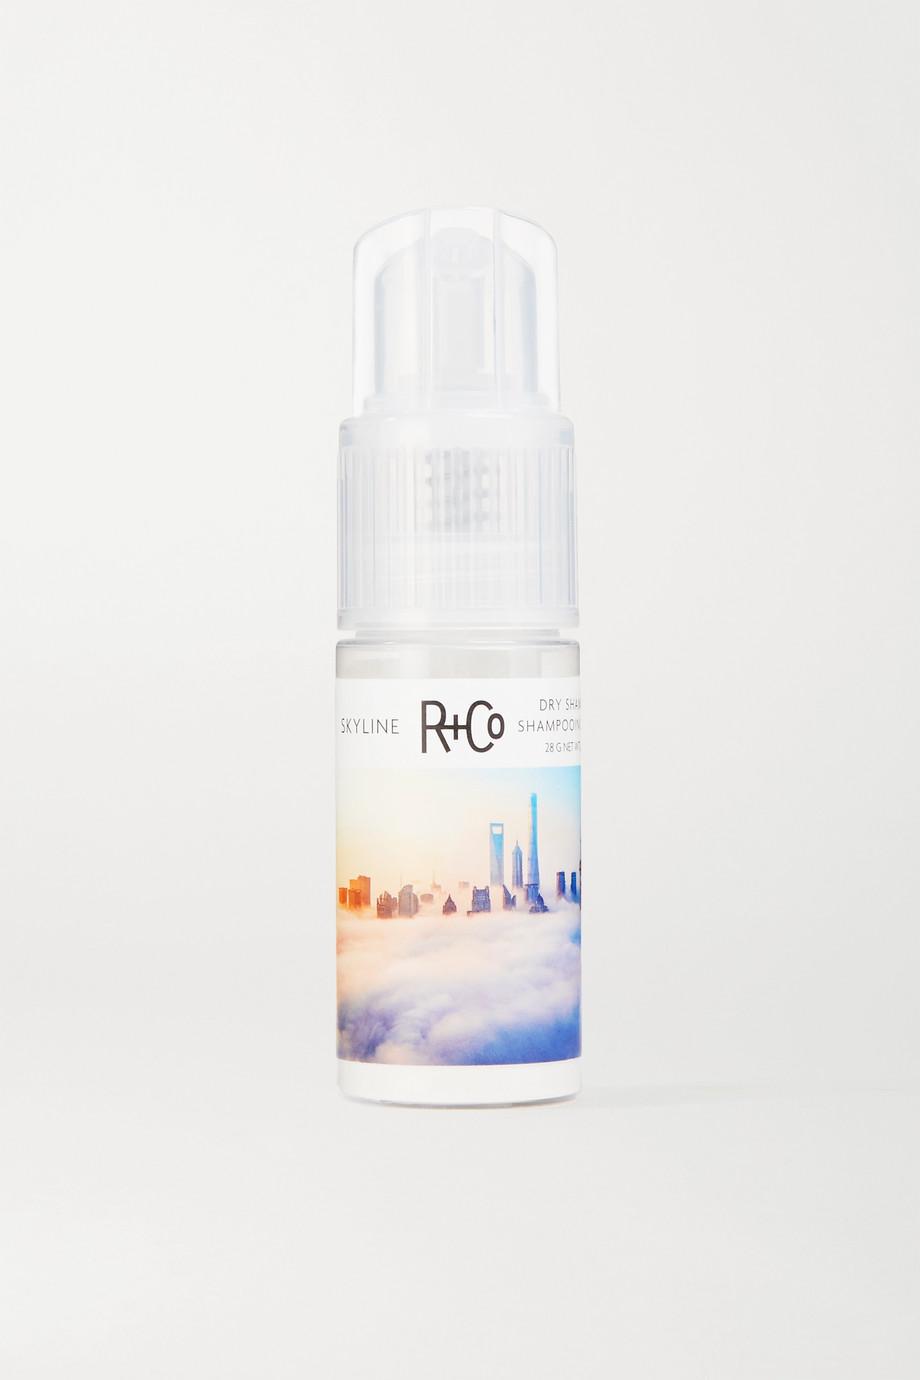 R+Co Skyline Dry Shampoo, 28g